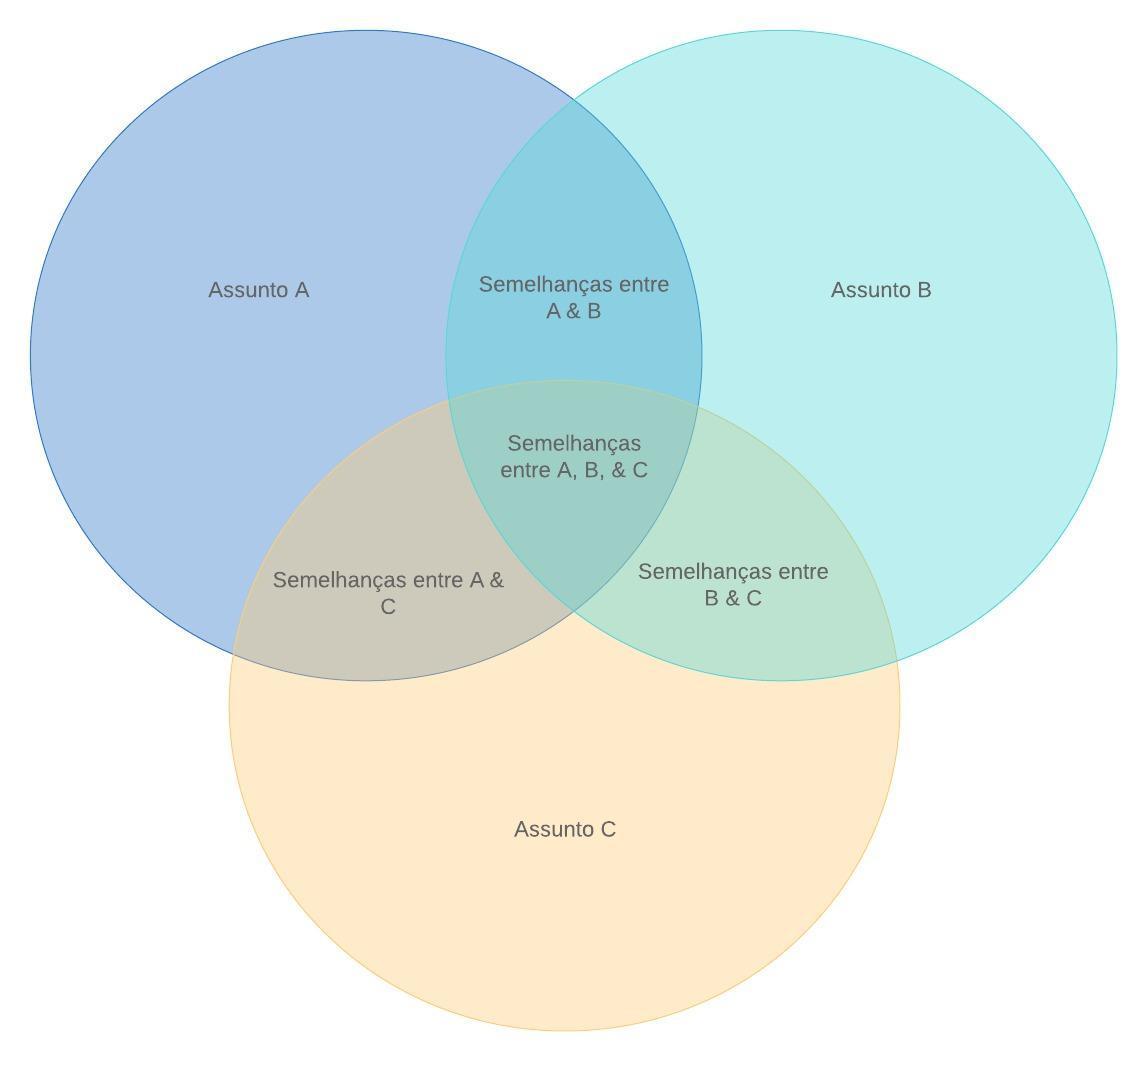 Diagrama de Venn com 3 conjuntos